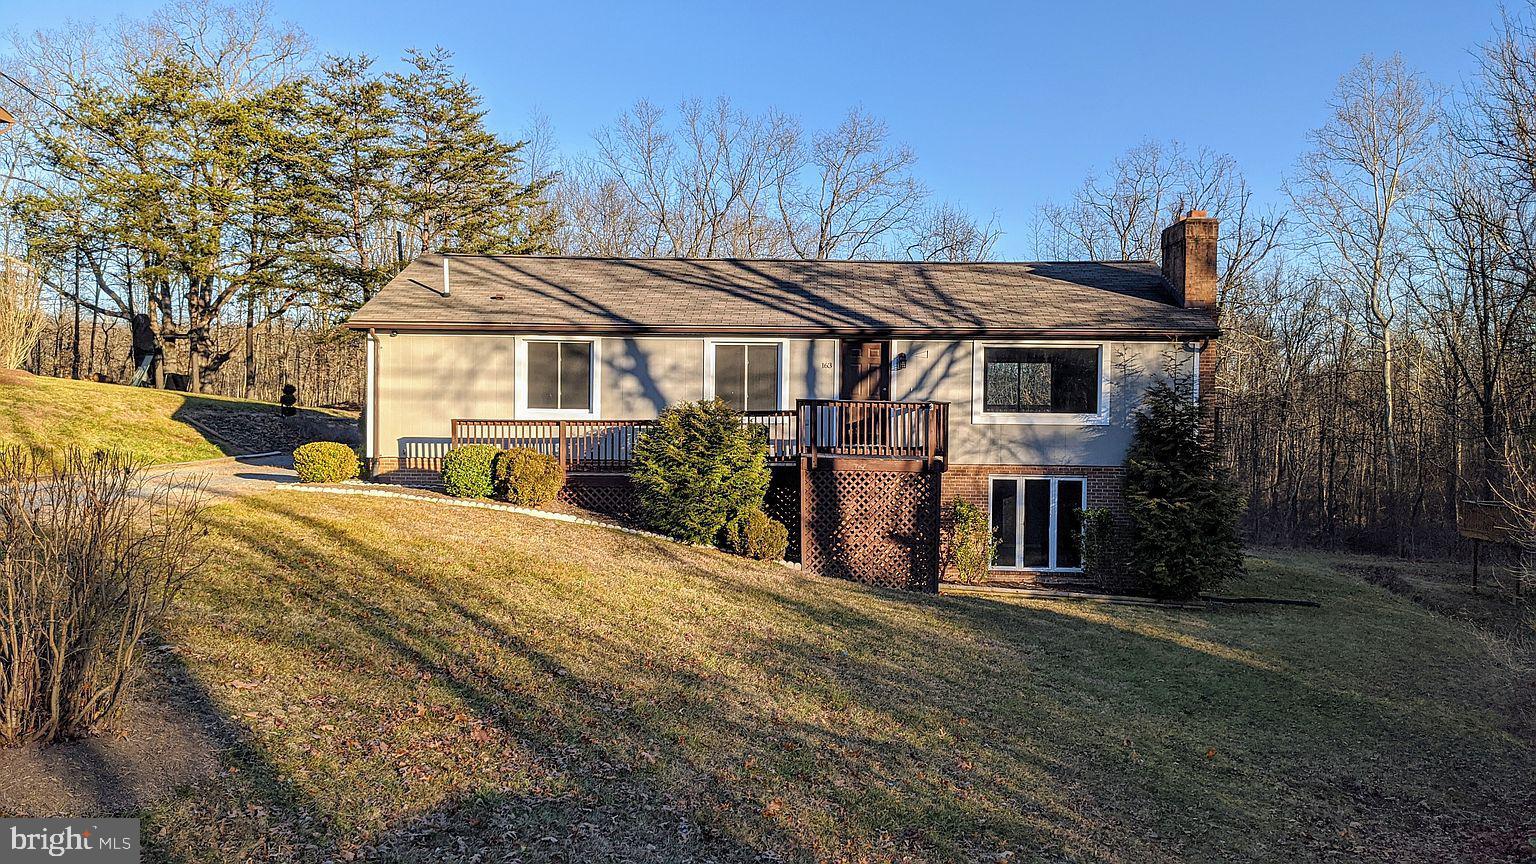 163 Lake Holiday Rd, Cross Junction, VA, 22625